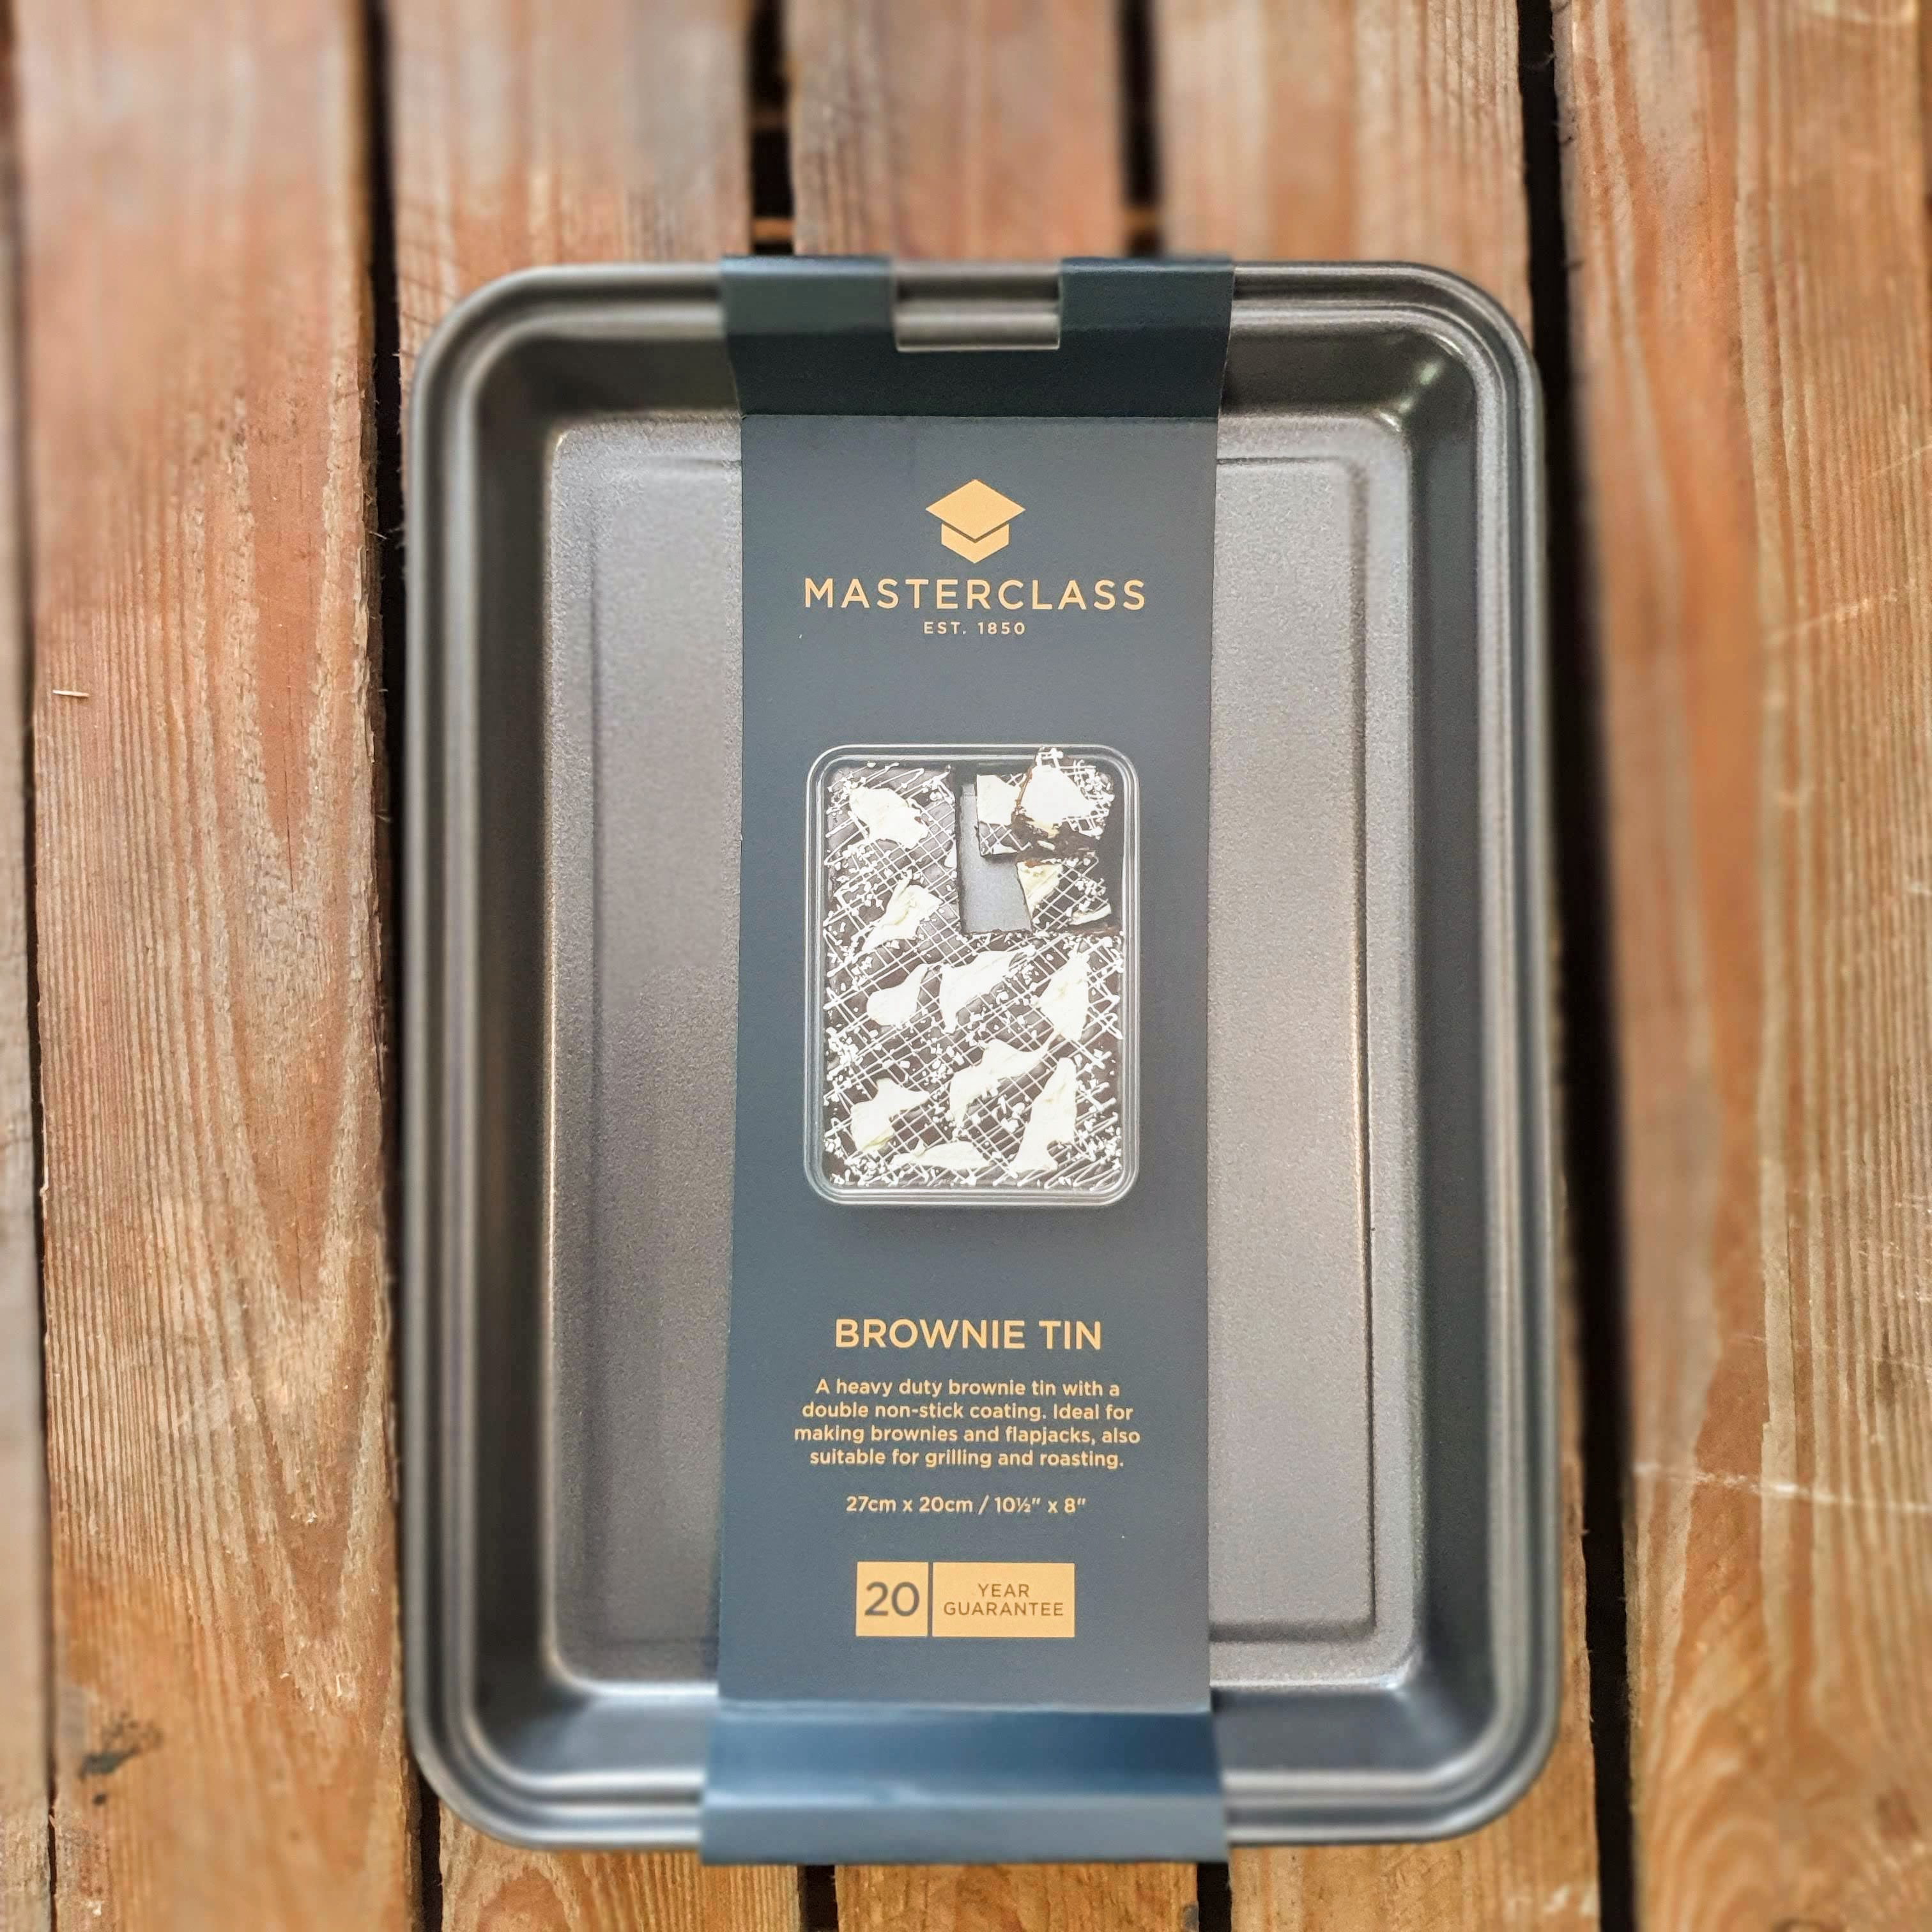 masterclass brownie tin 1